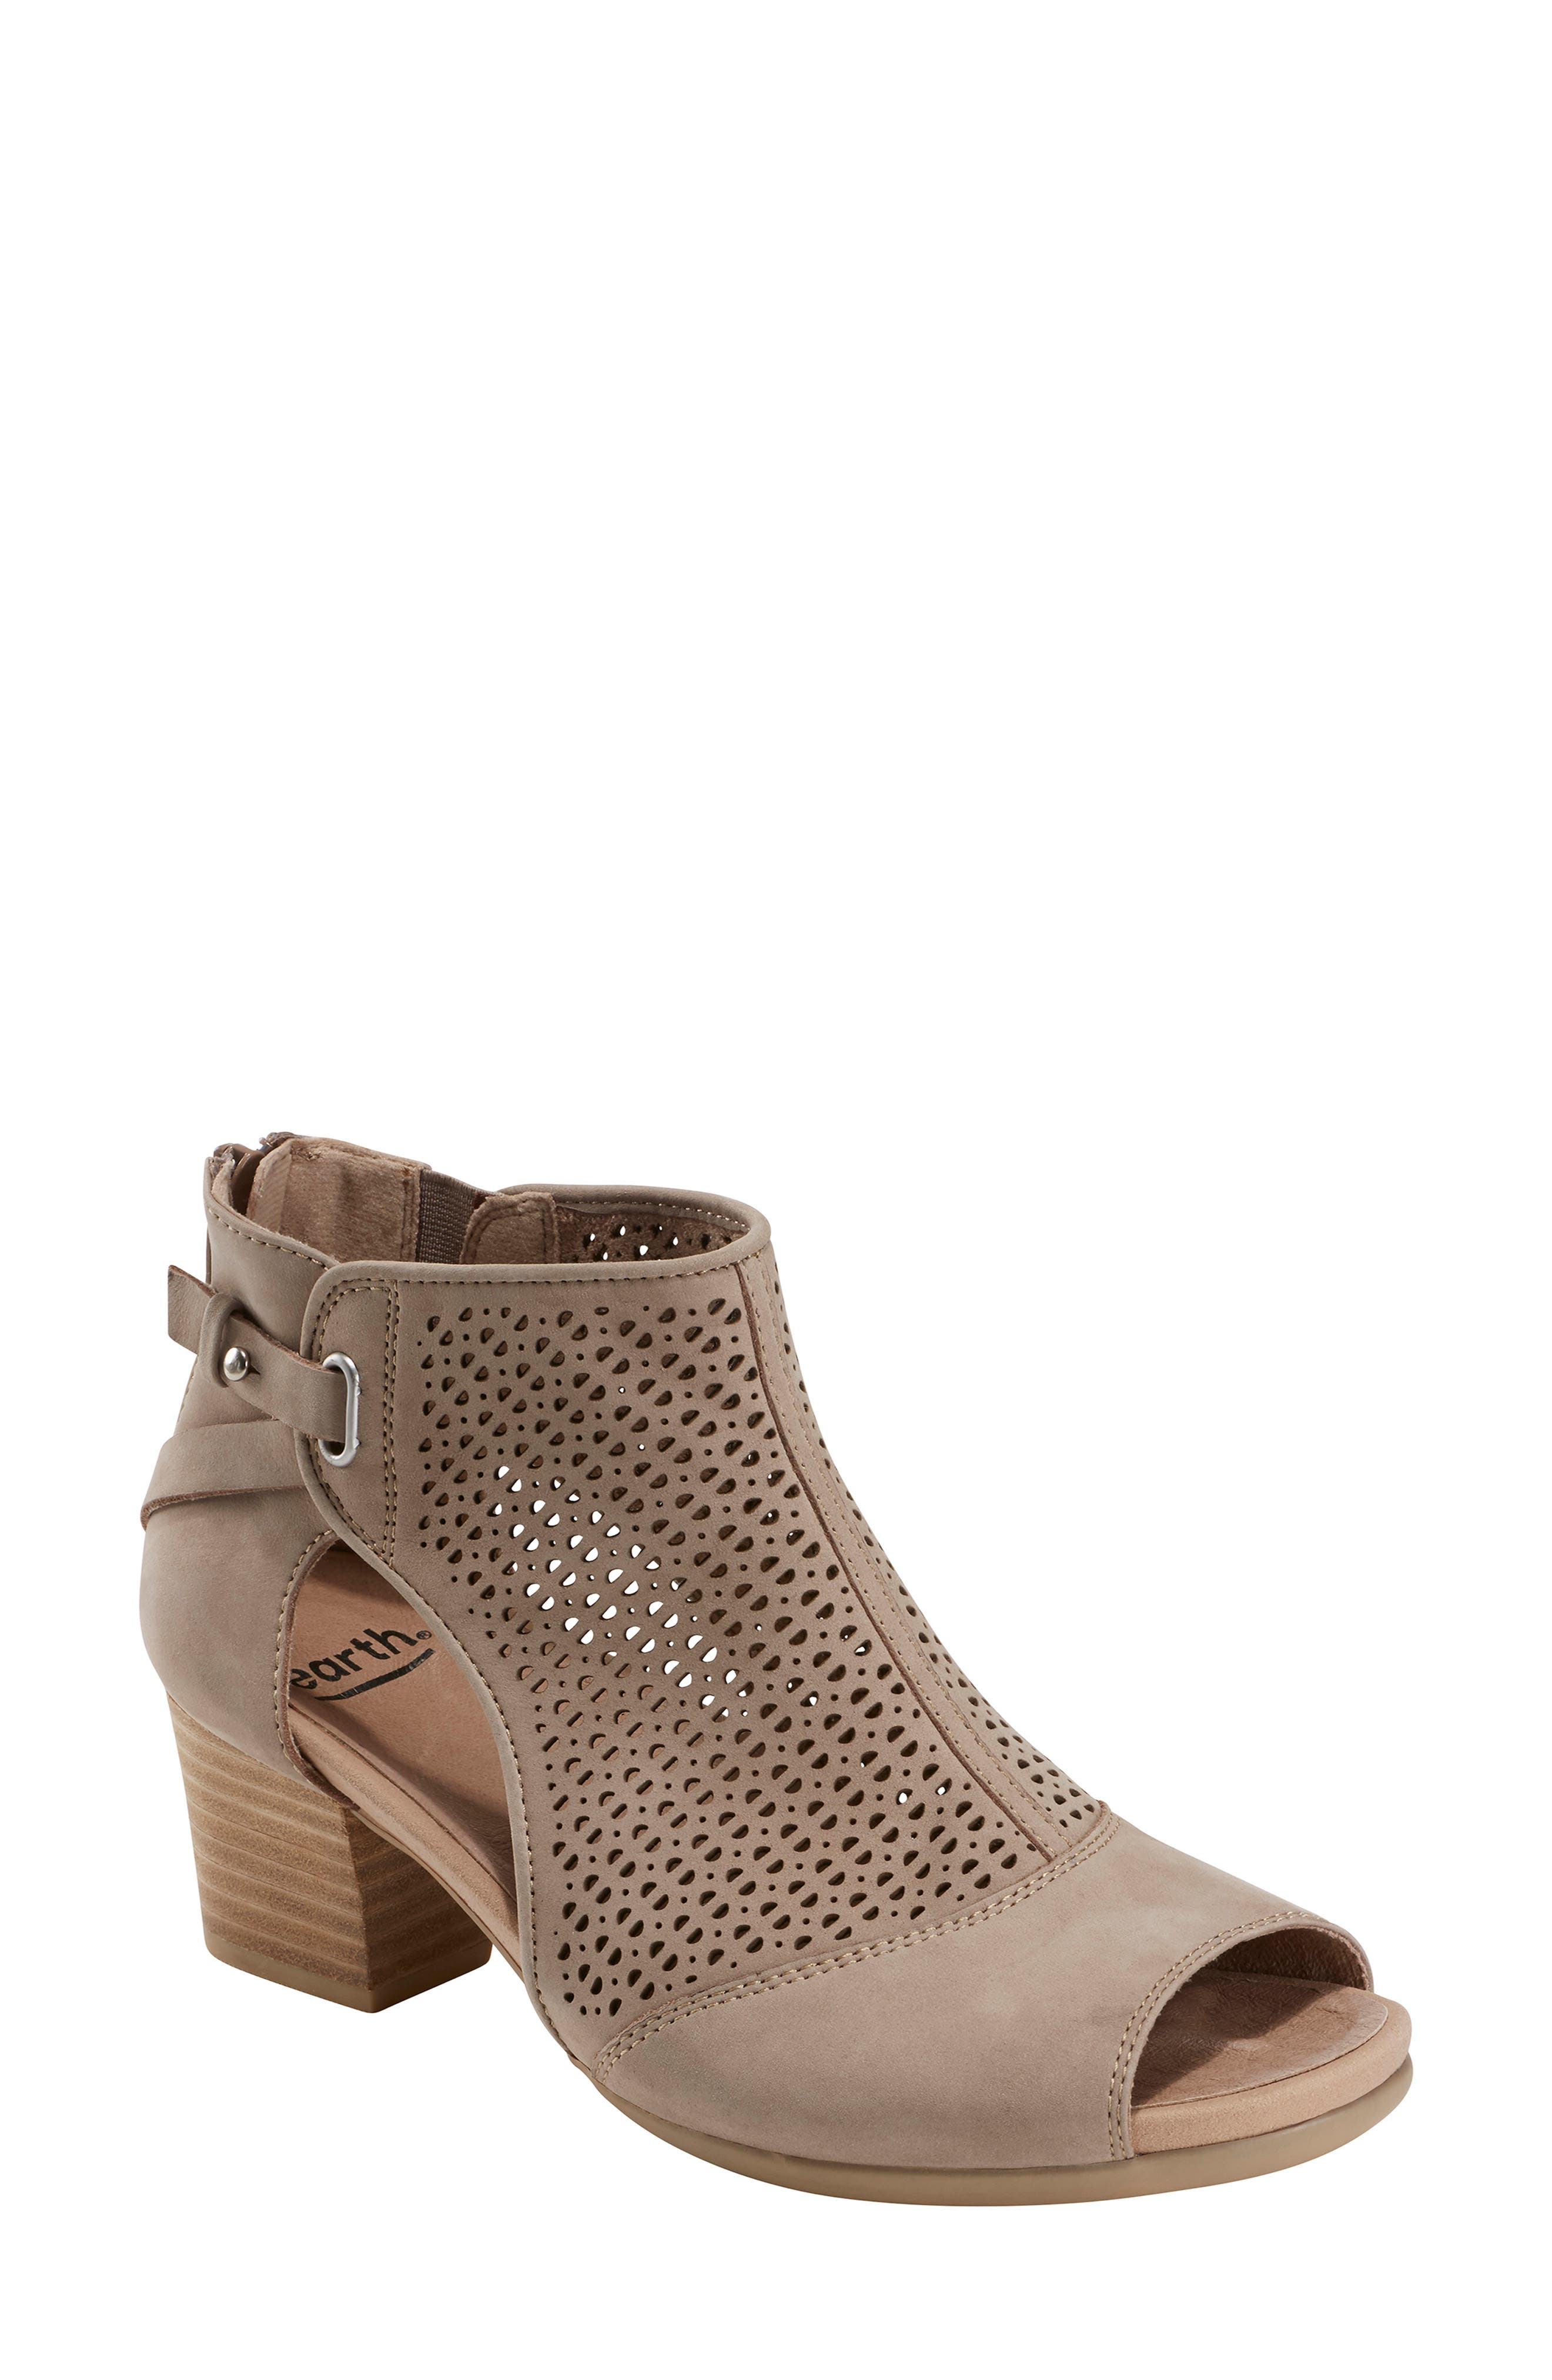 Women's Earth® Shoes Sale \u0026 Clearance